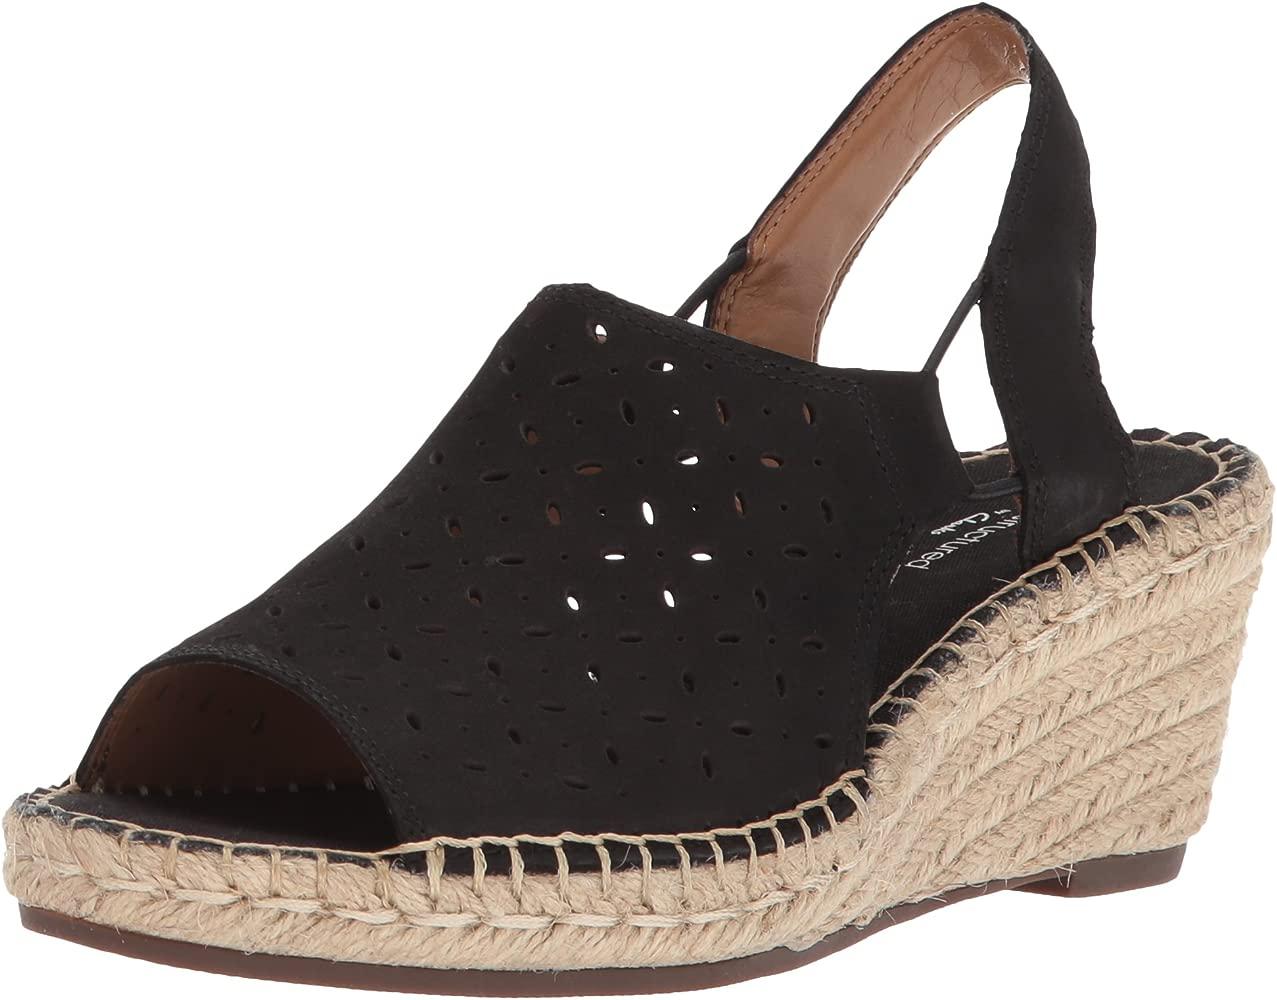 Ladies Clarks Petrina Gail Slingback Leather Wedge Heel Sandals